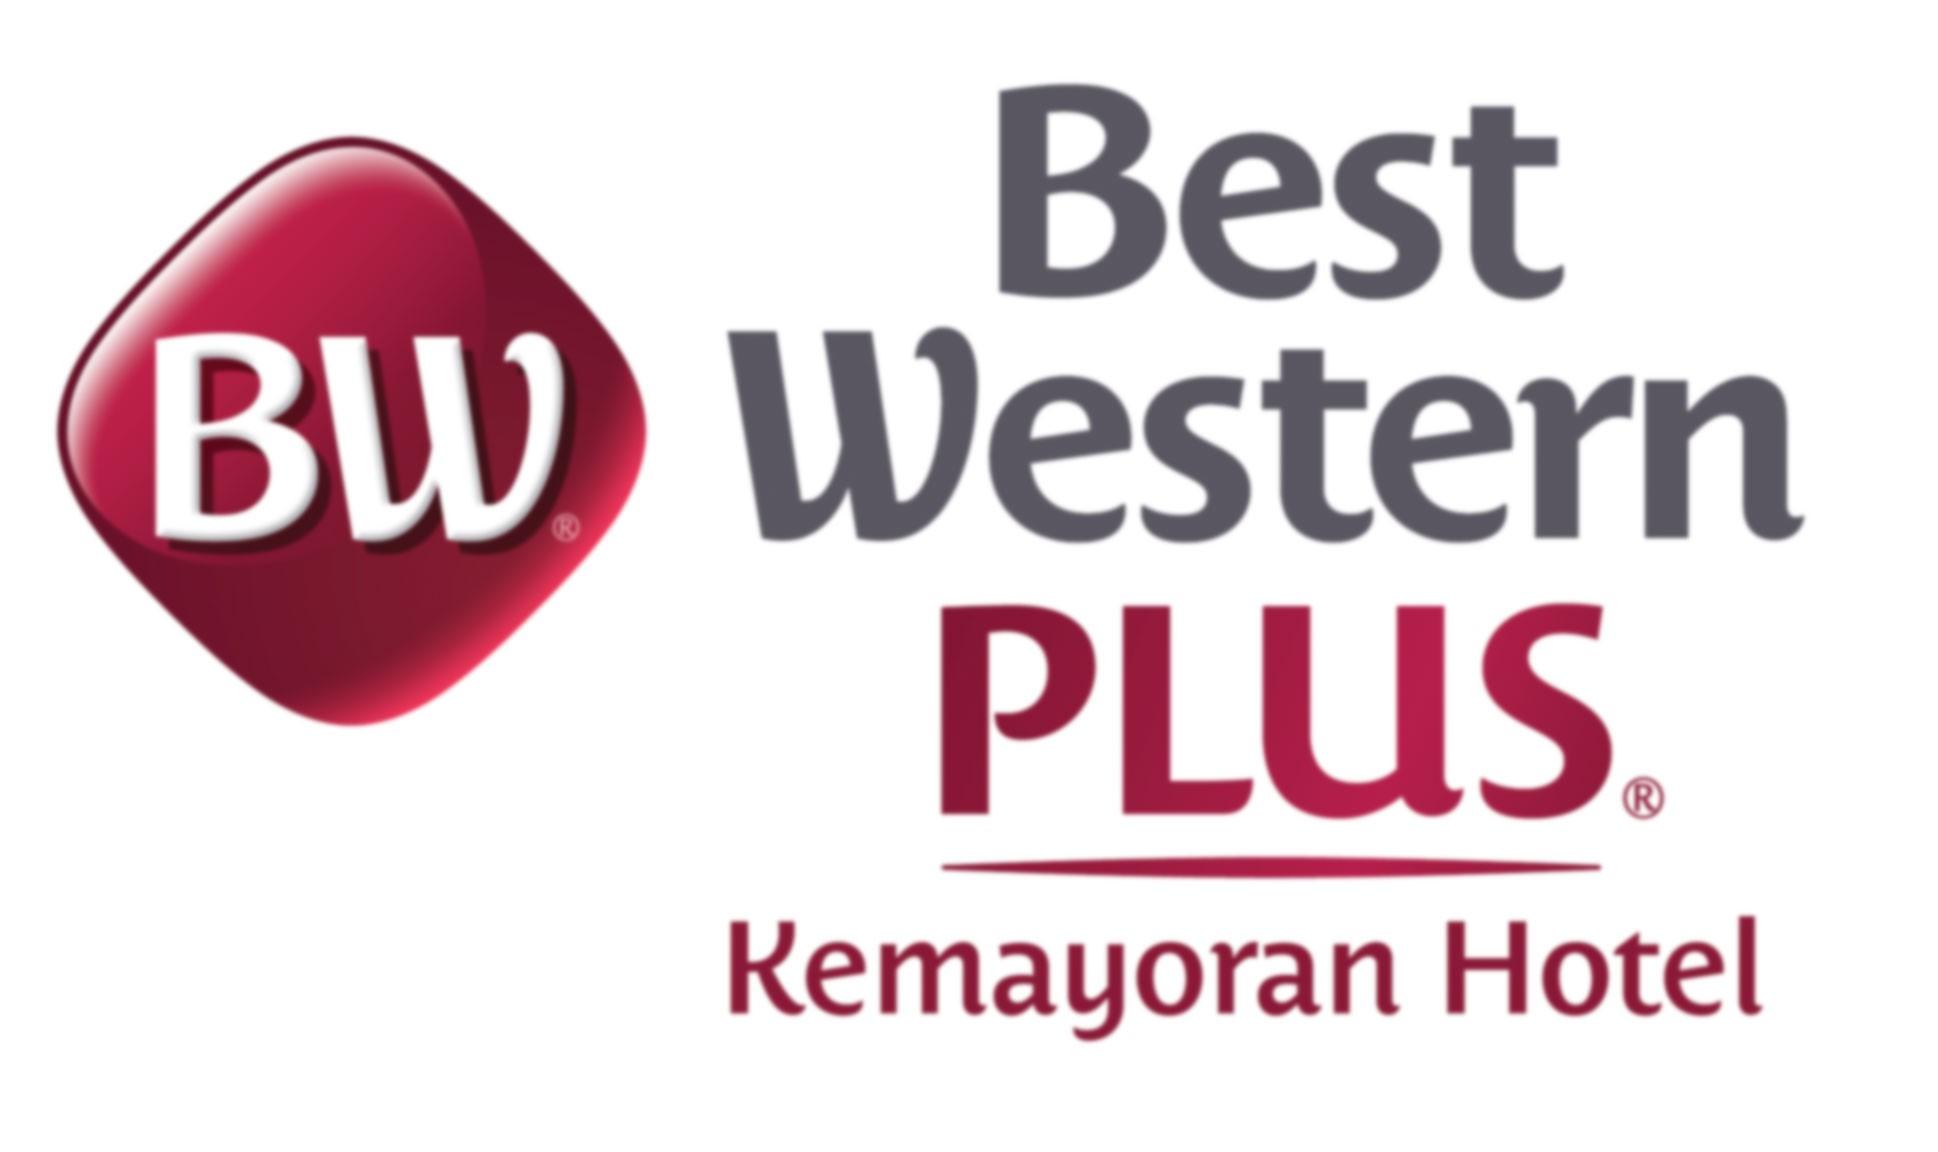 BEST-WESTERN-PLUS